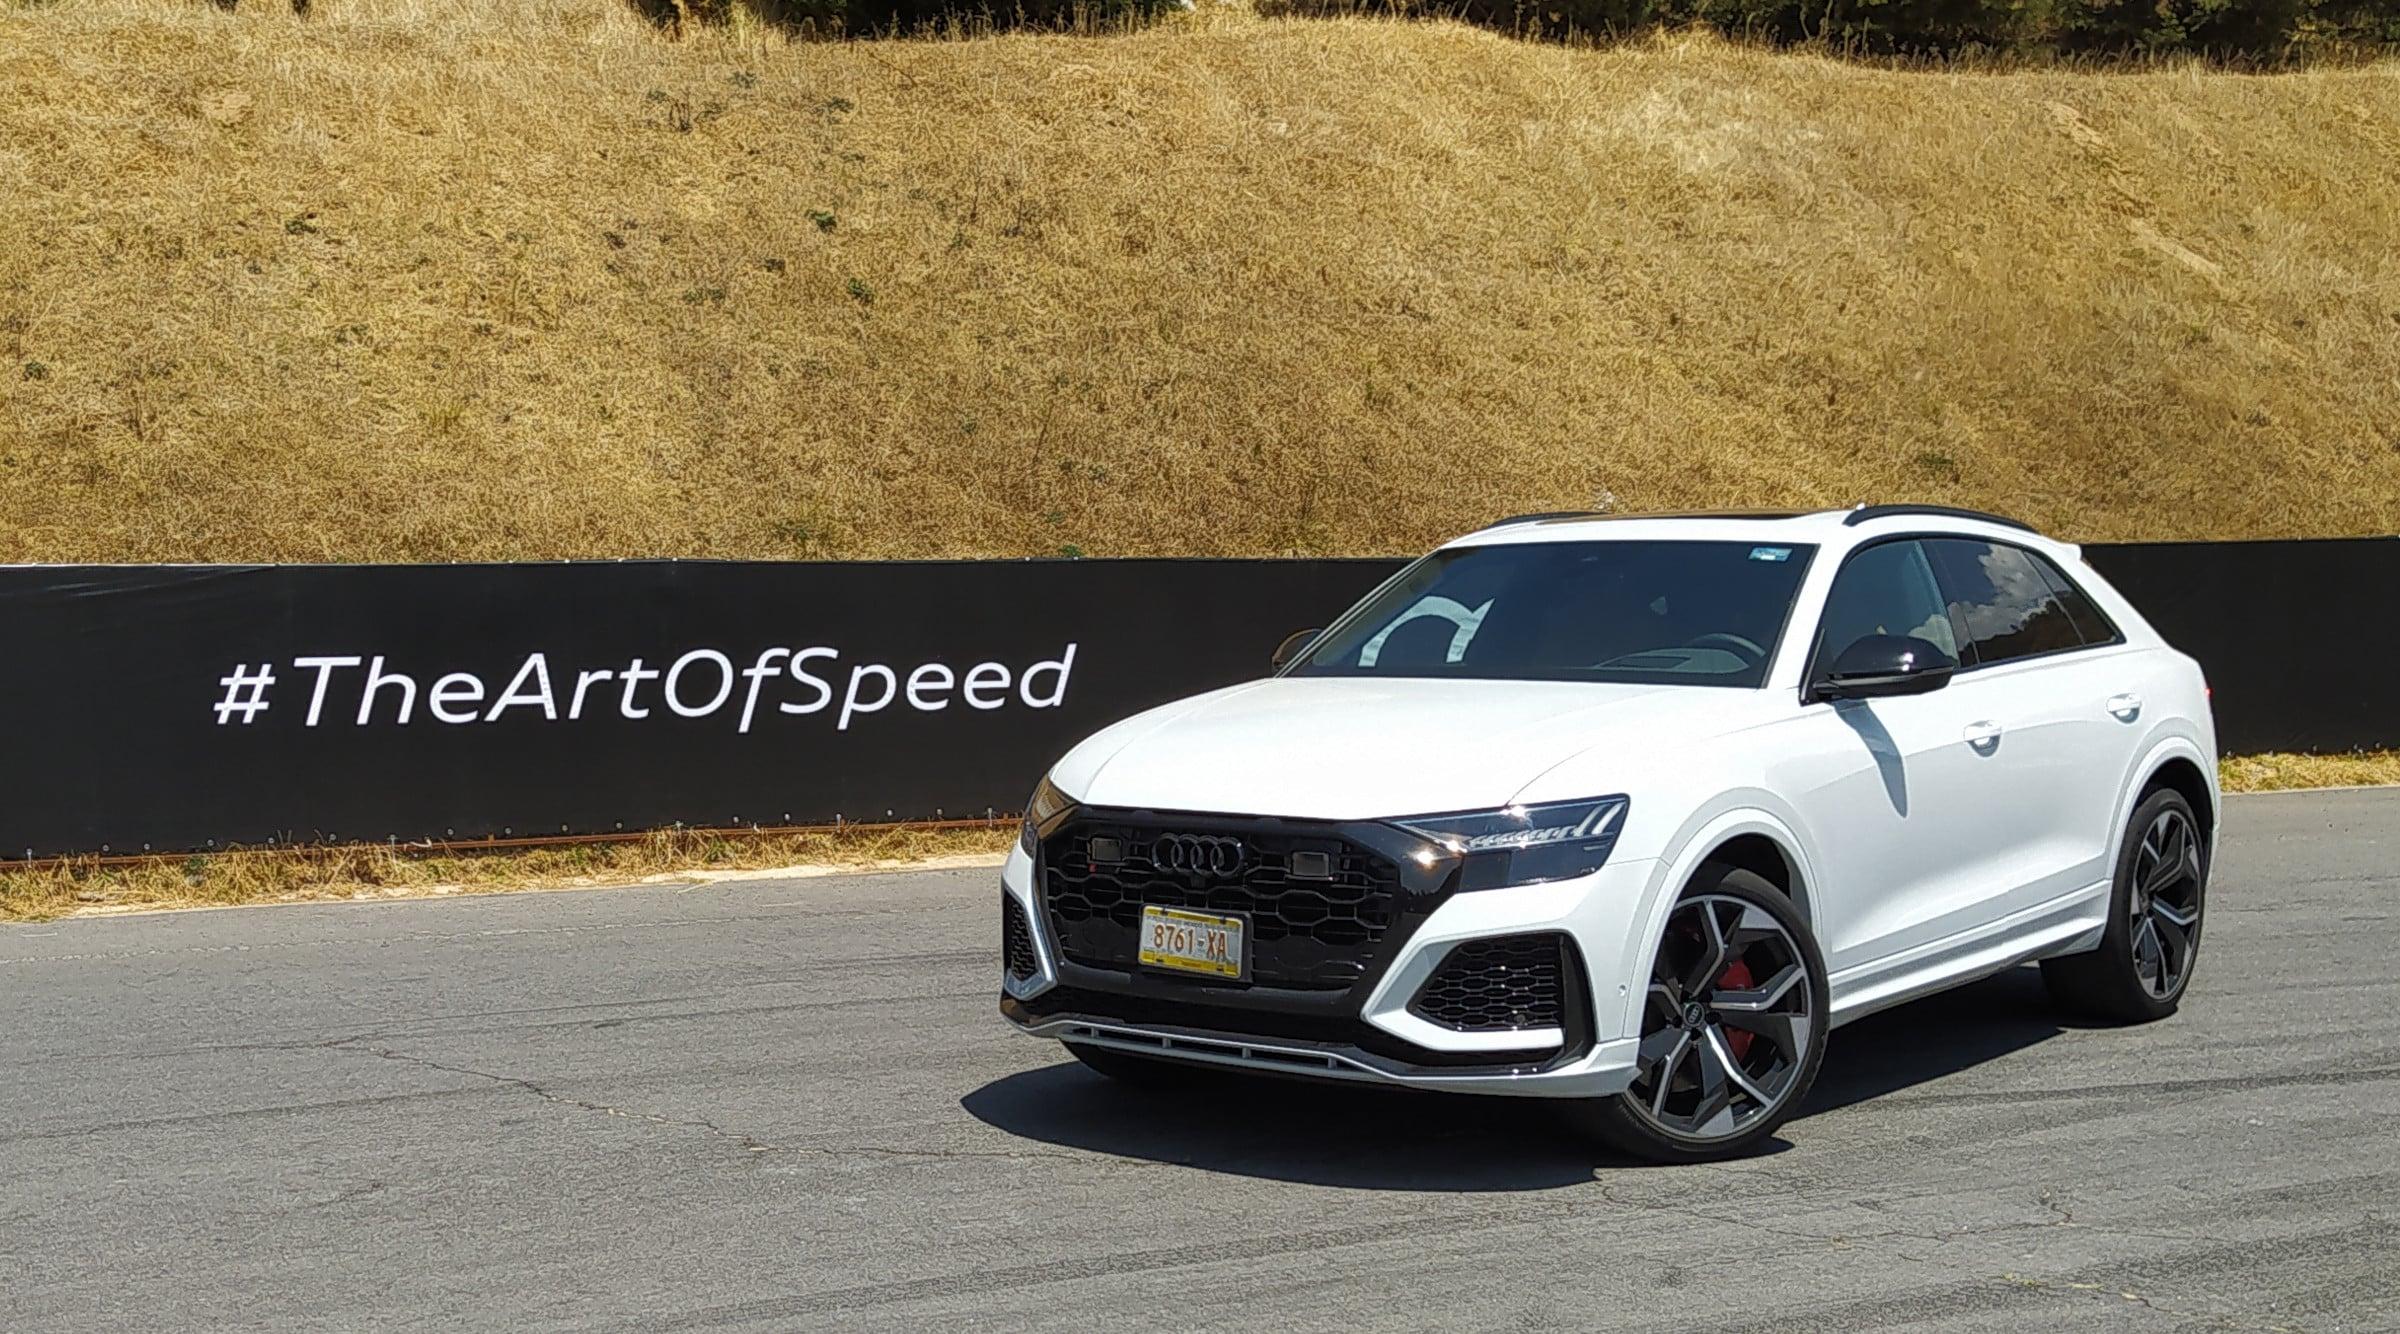 Martes de deportivos: Audi RS Q8, Mercedes-AMG GLE 63 y BMW X6 M.